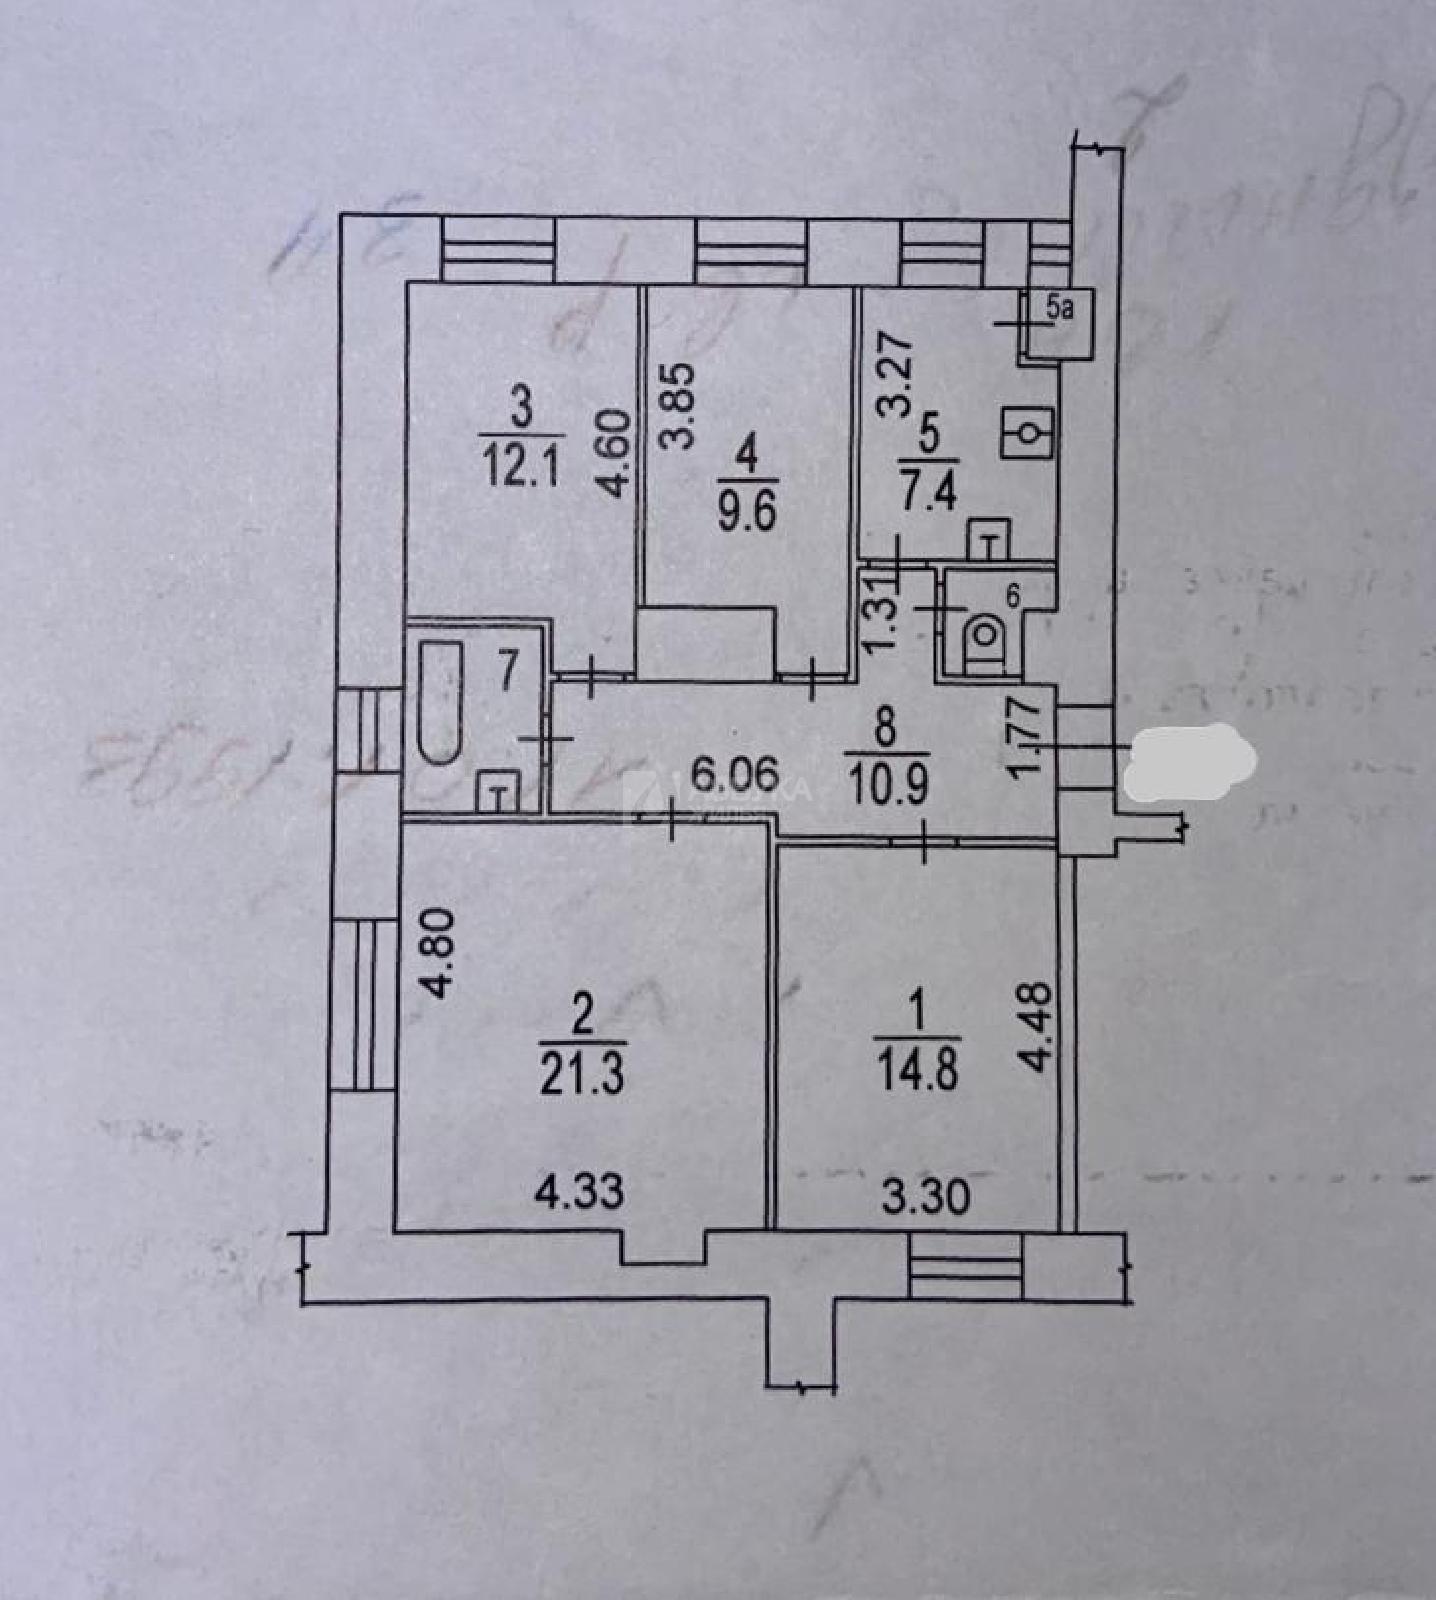 Фото №7 - 4-комнатная квартира, Москва, Ленинградский проспект 14 корпус 1, метро Белорусская